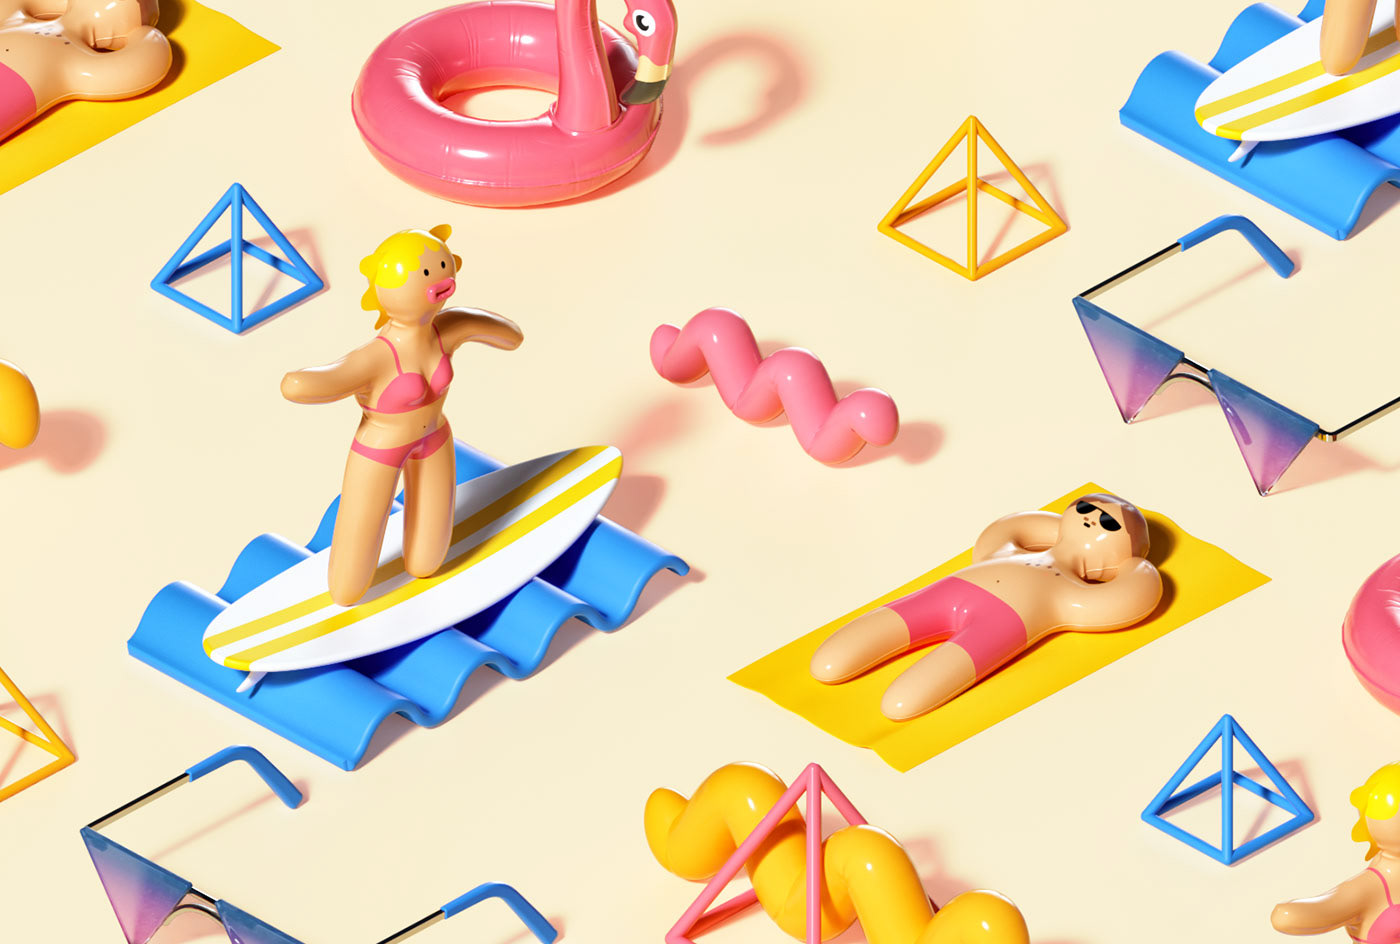 Image may contain: cartoon, indoor and birthday